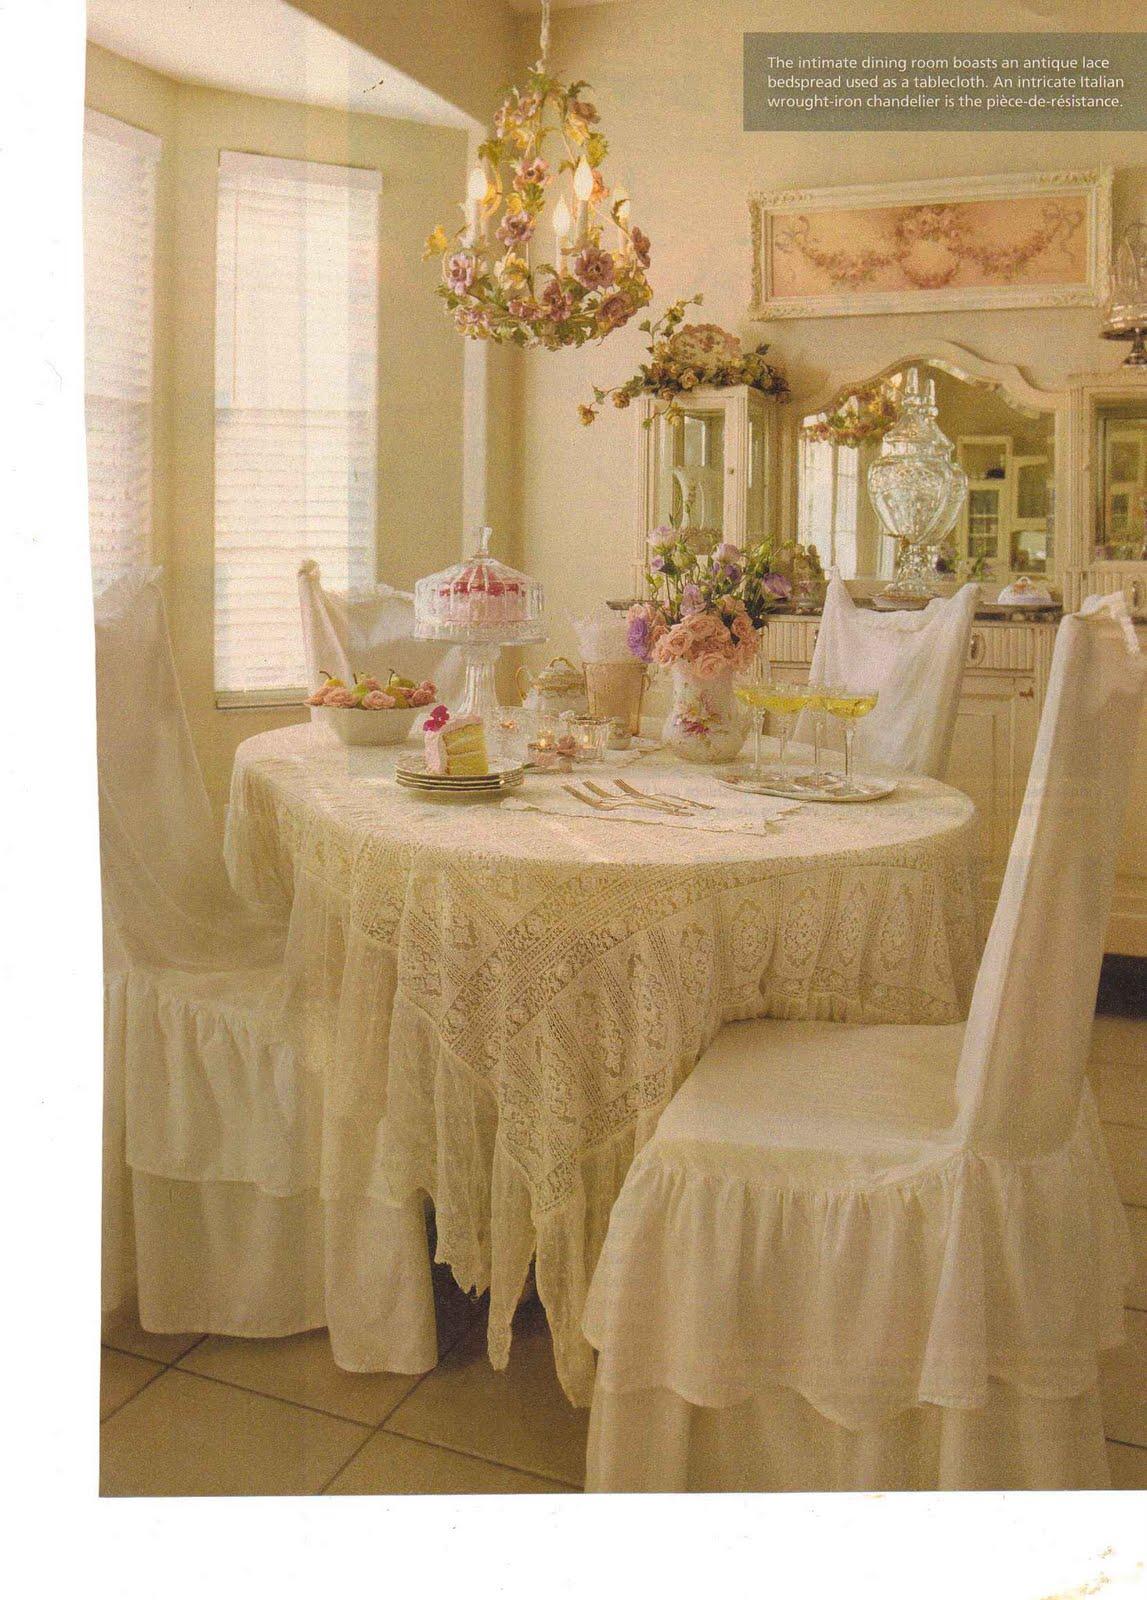 daphne nicole lynda cade ruffles lace. Black Bedroom Furniture Sets. Home Design Ideas